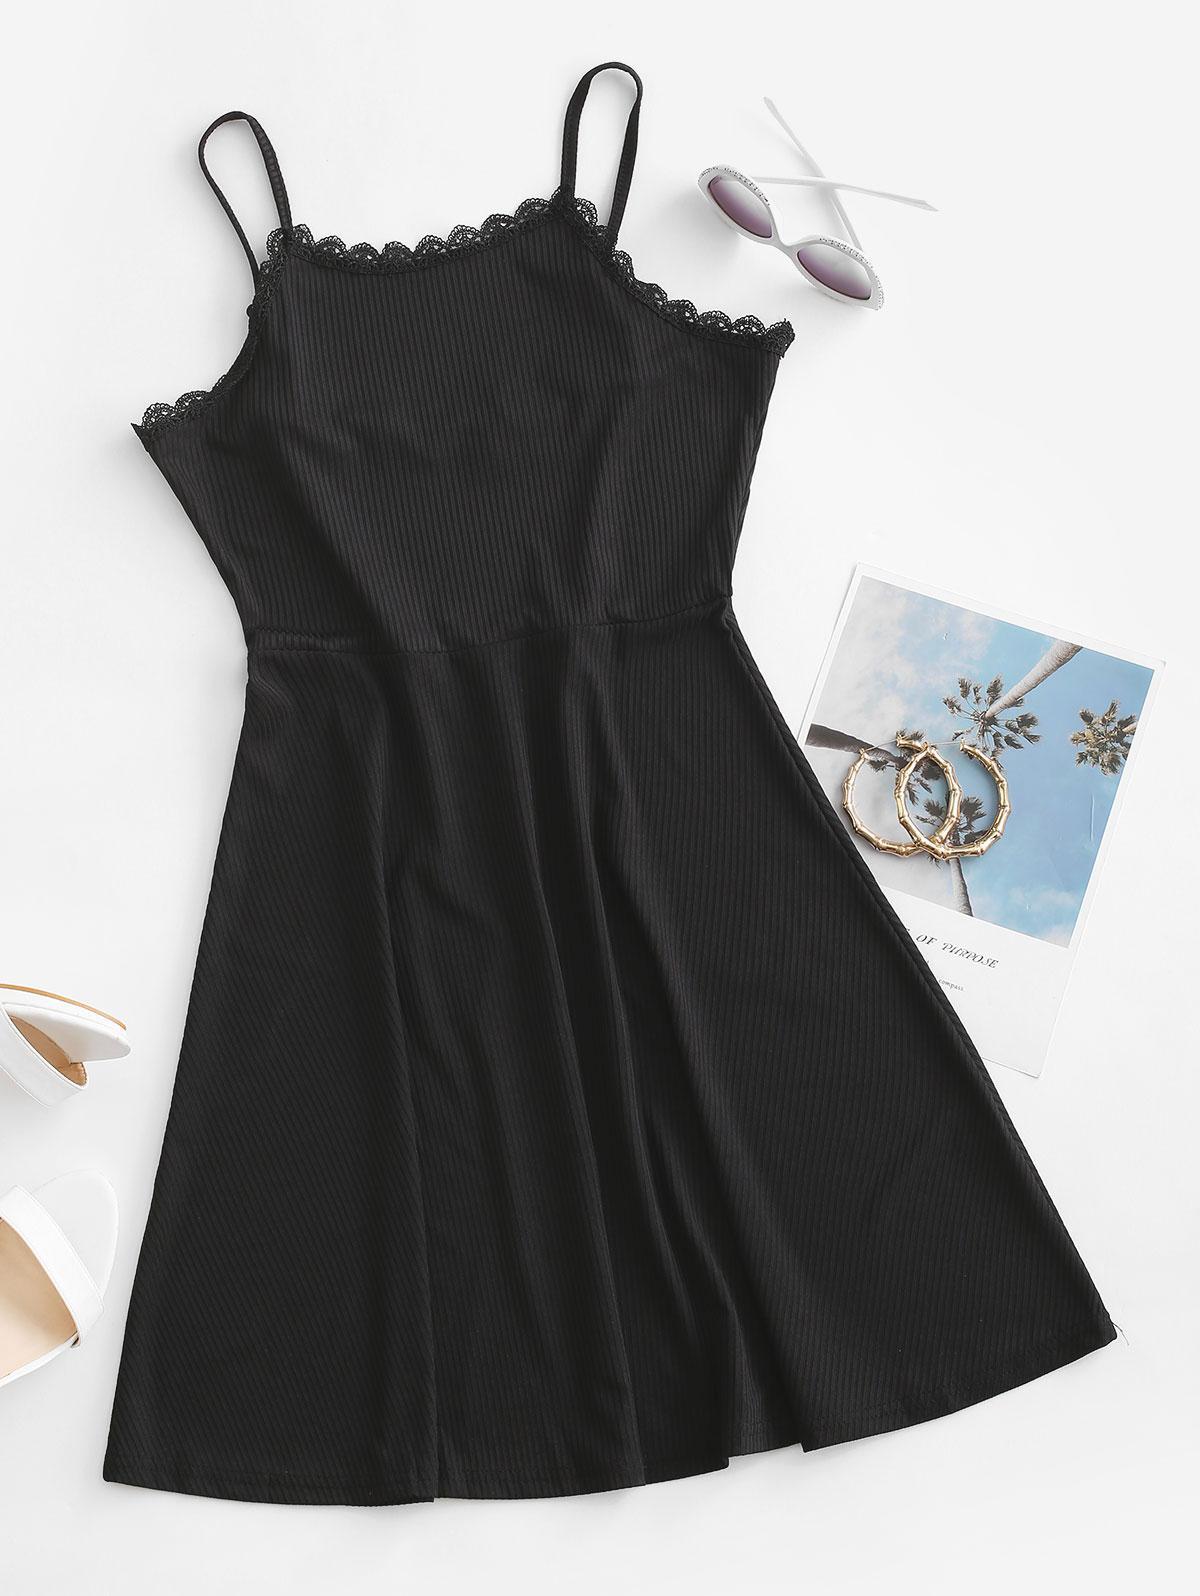 Ribbed Lace Trim Skater Dress